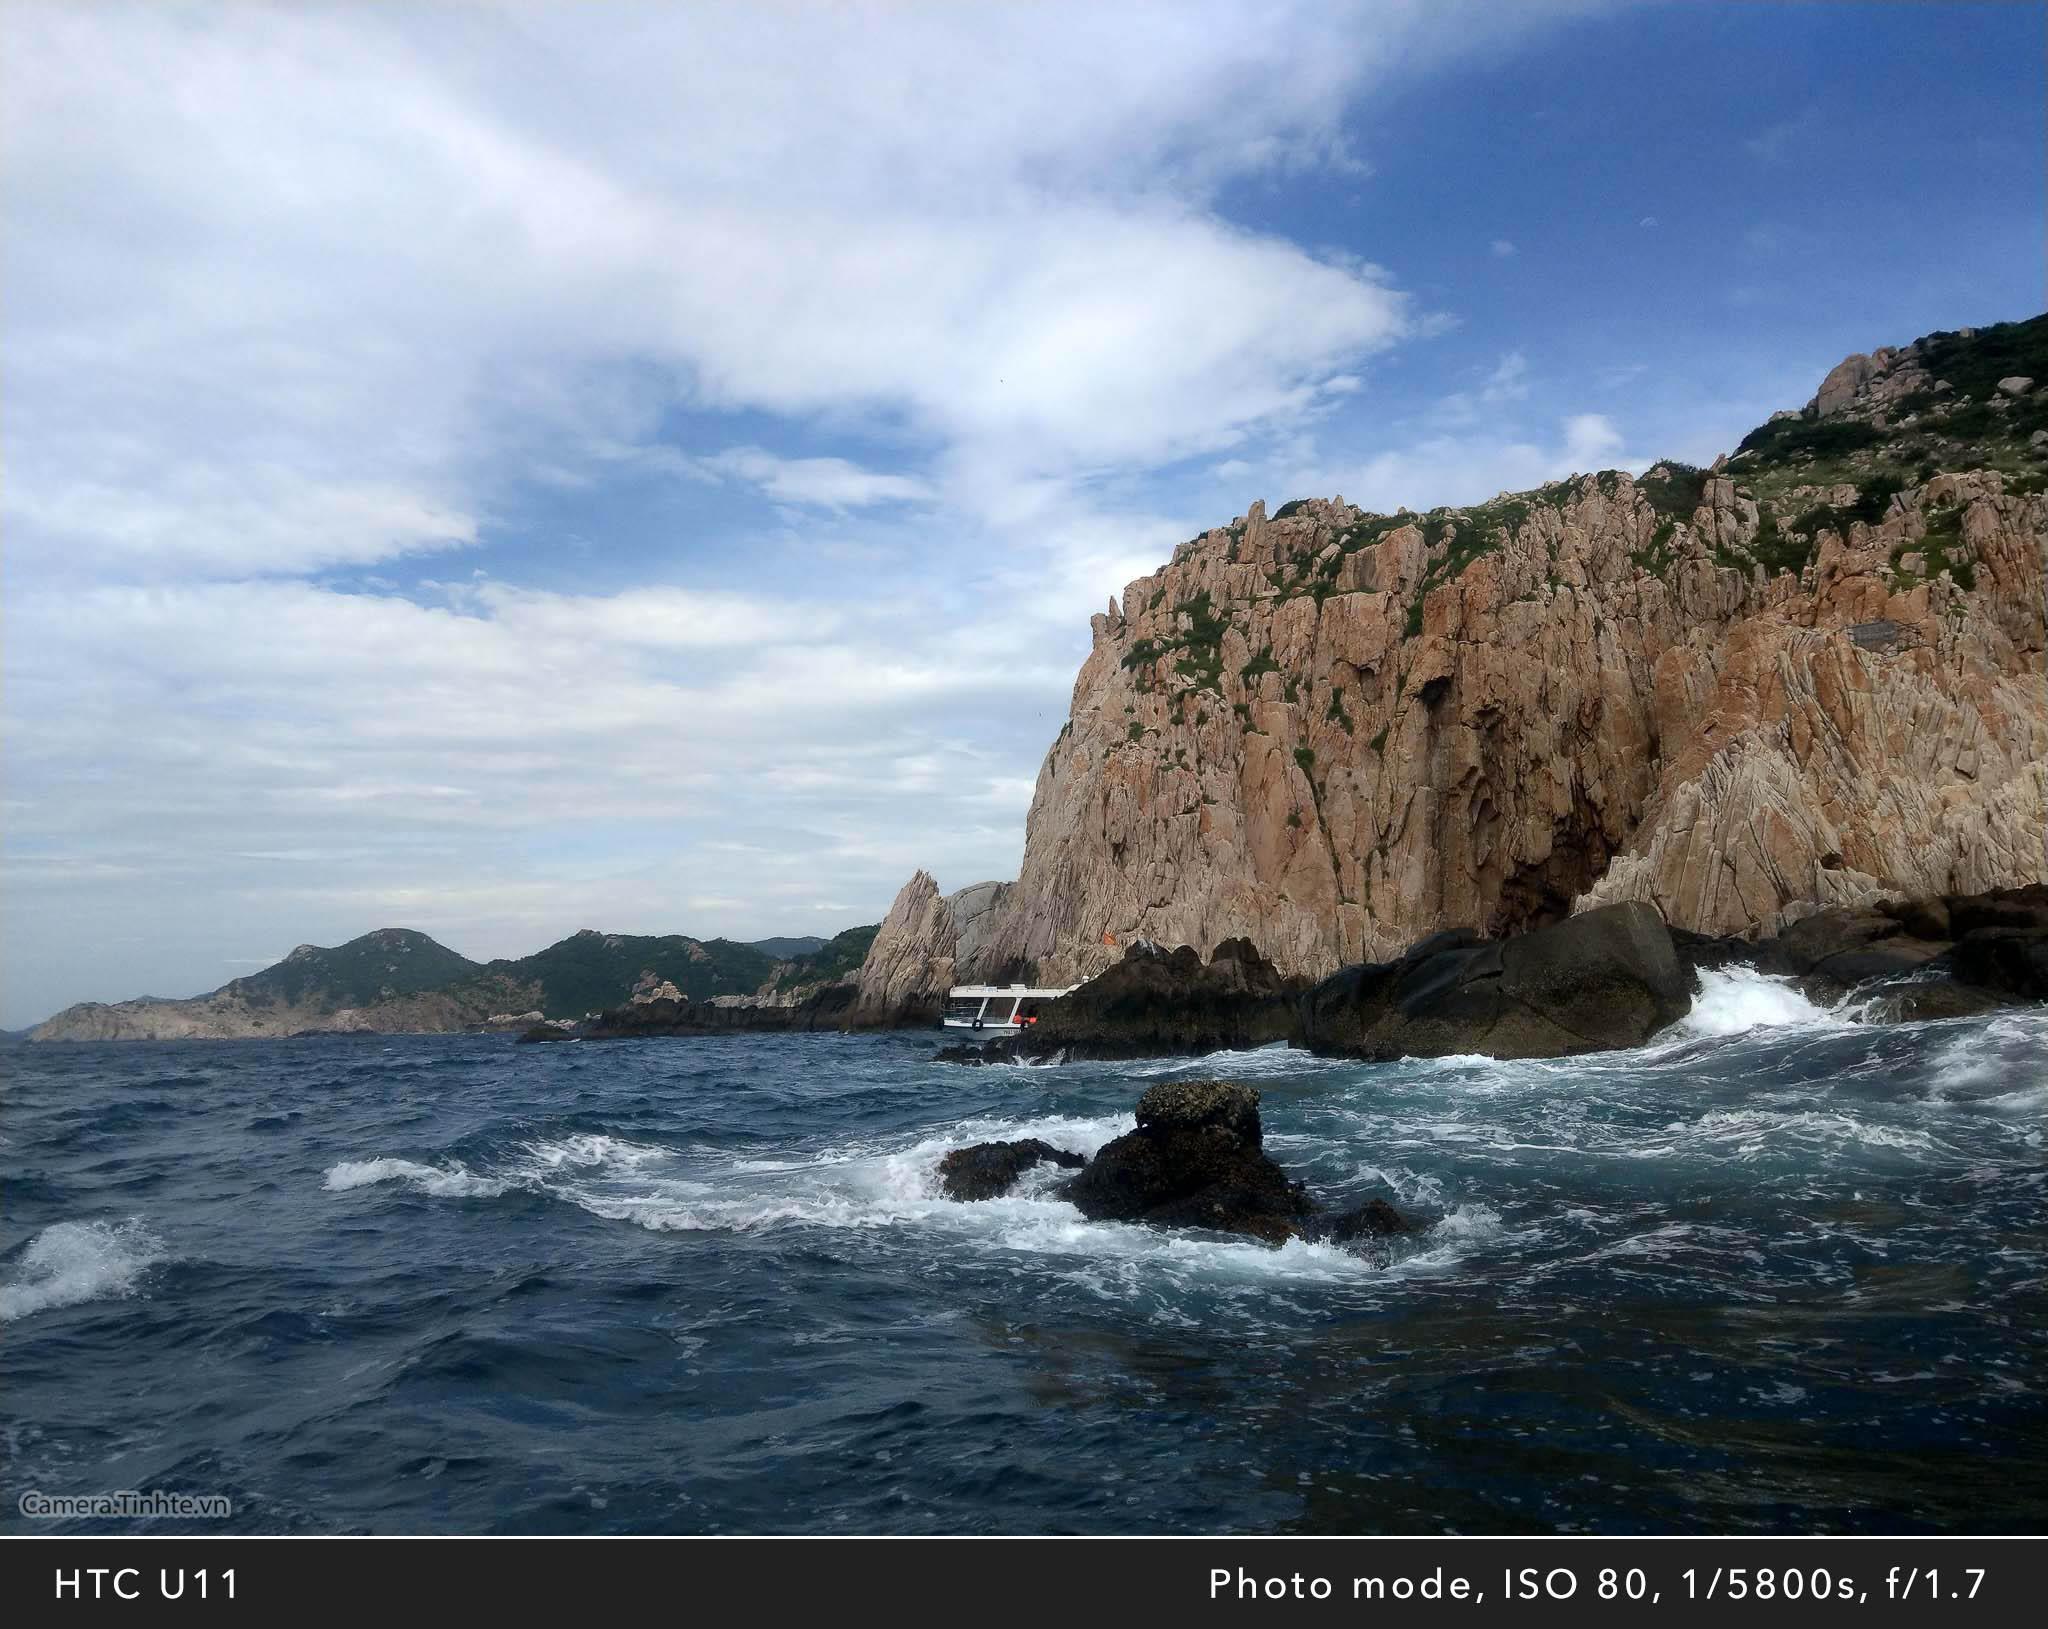 Camera.Tinhte_HTC U11_IMAG1296.jpg